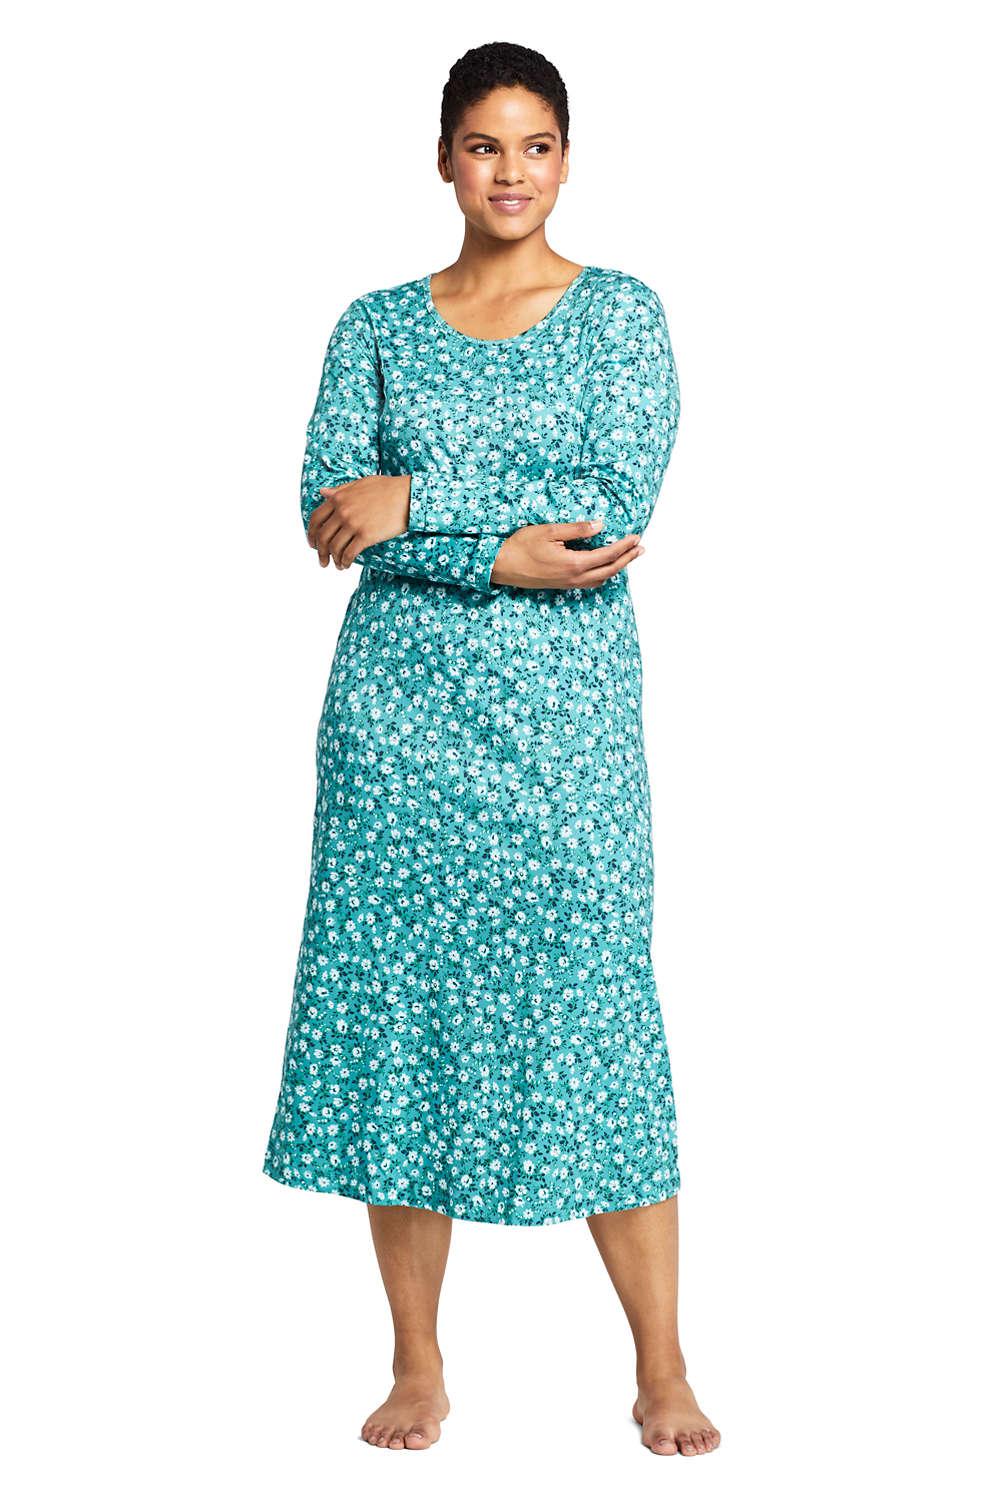 847e1d139 Women's Plus Size Supima Cotton Long Sleeve Midcalf Nightgown - Print